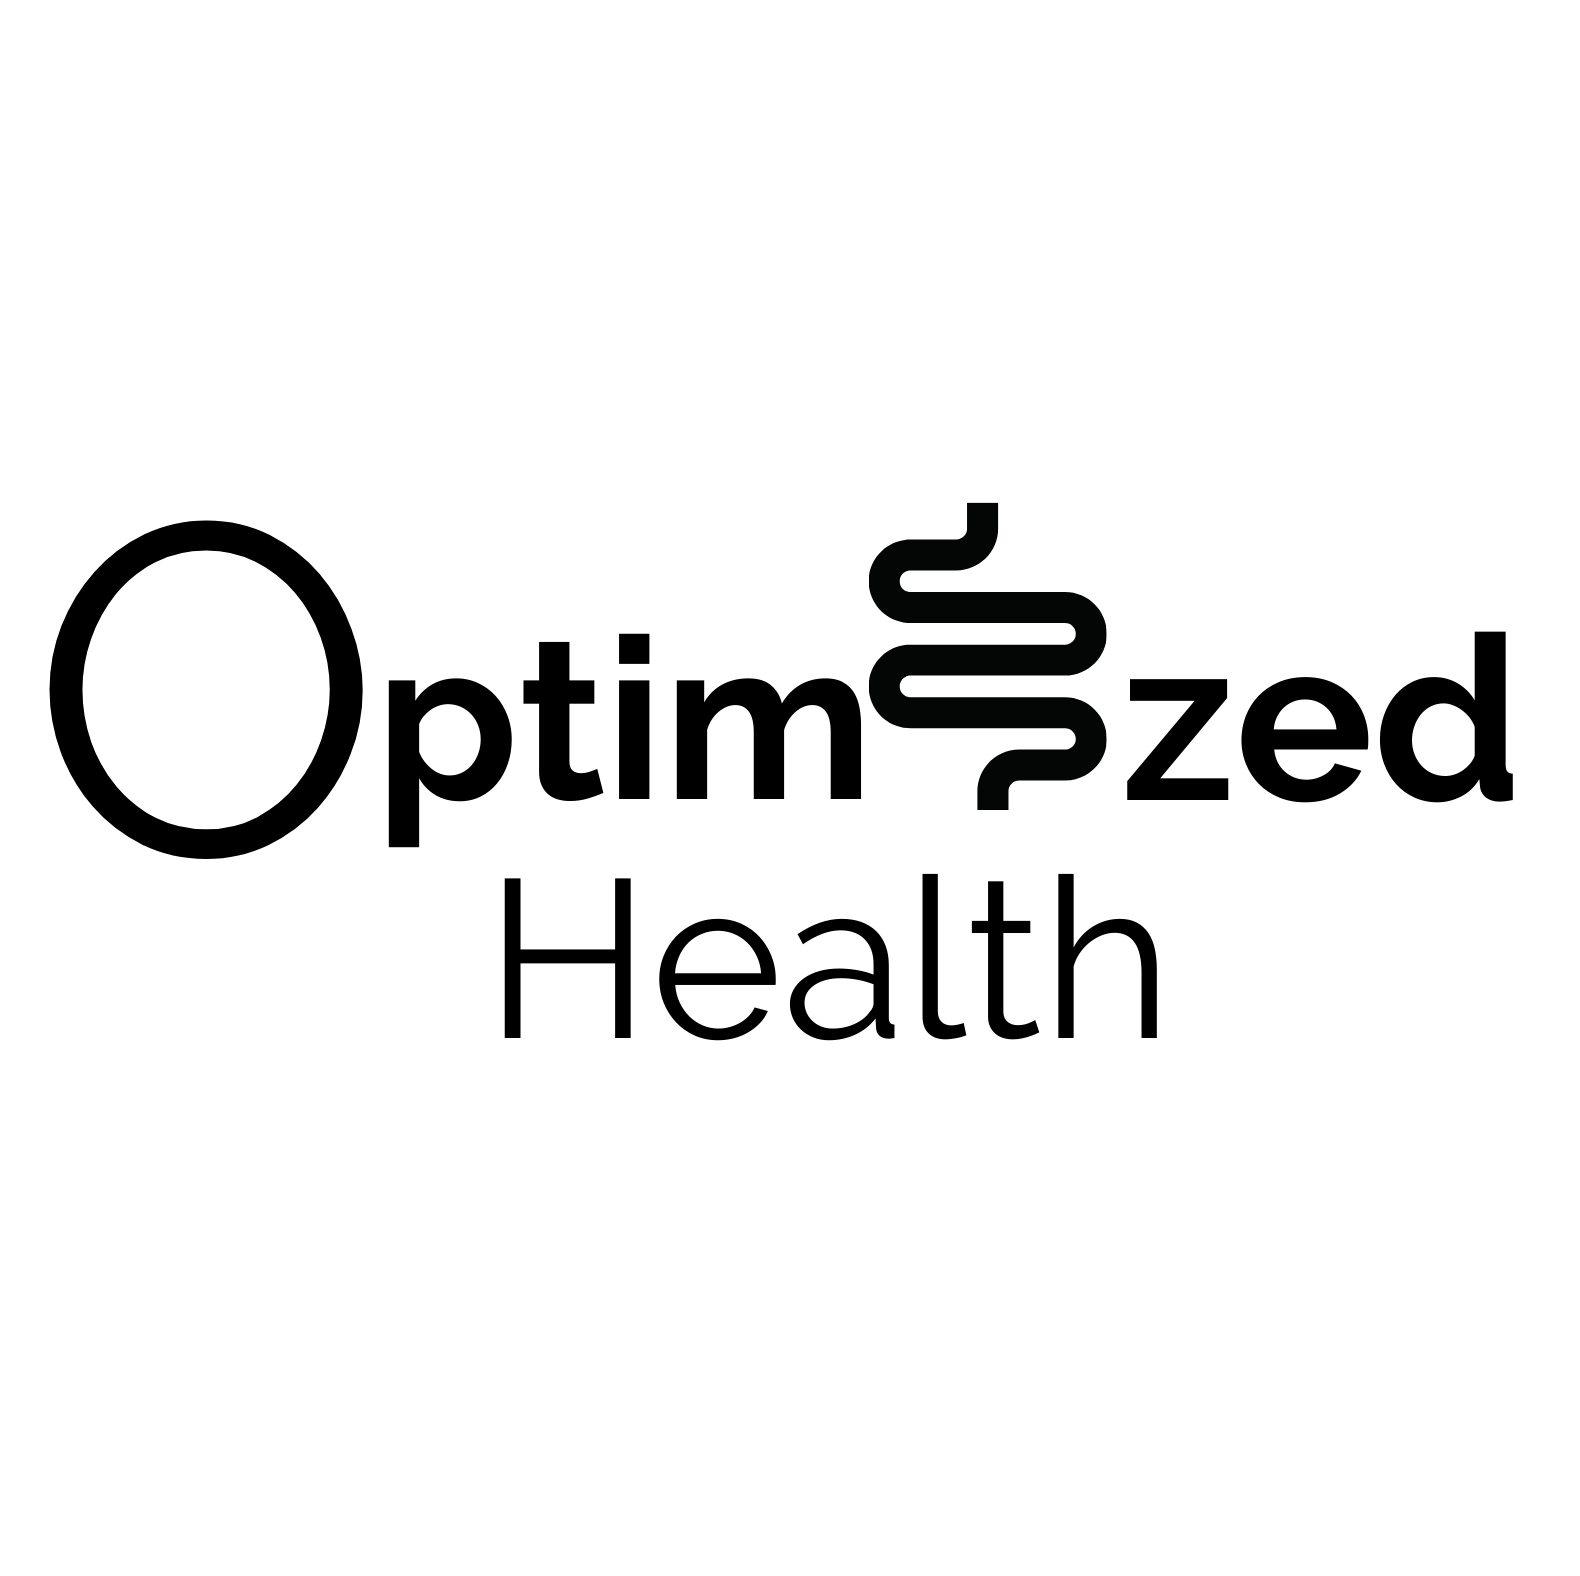 Optimized Health